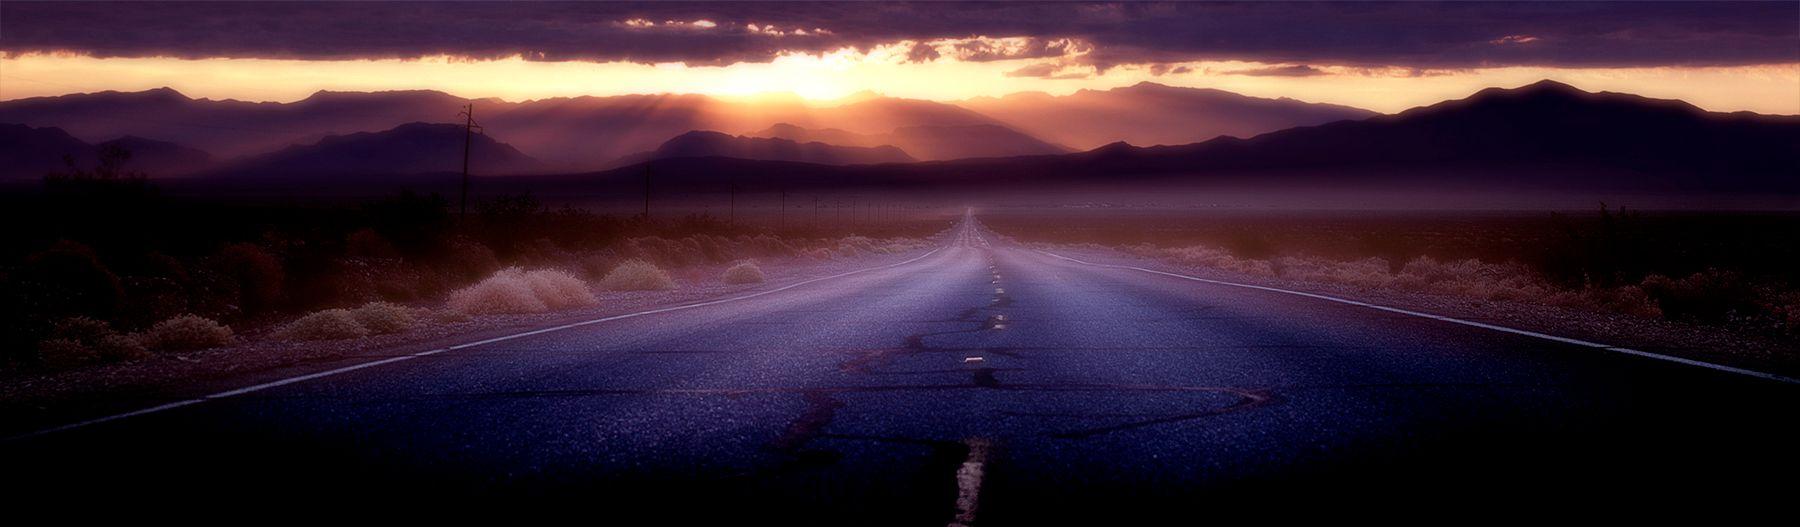 ROAD SUNRISE.jpg